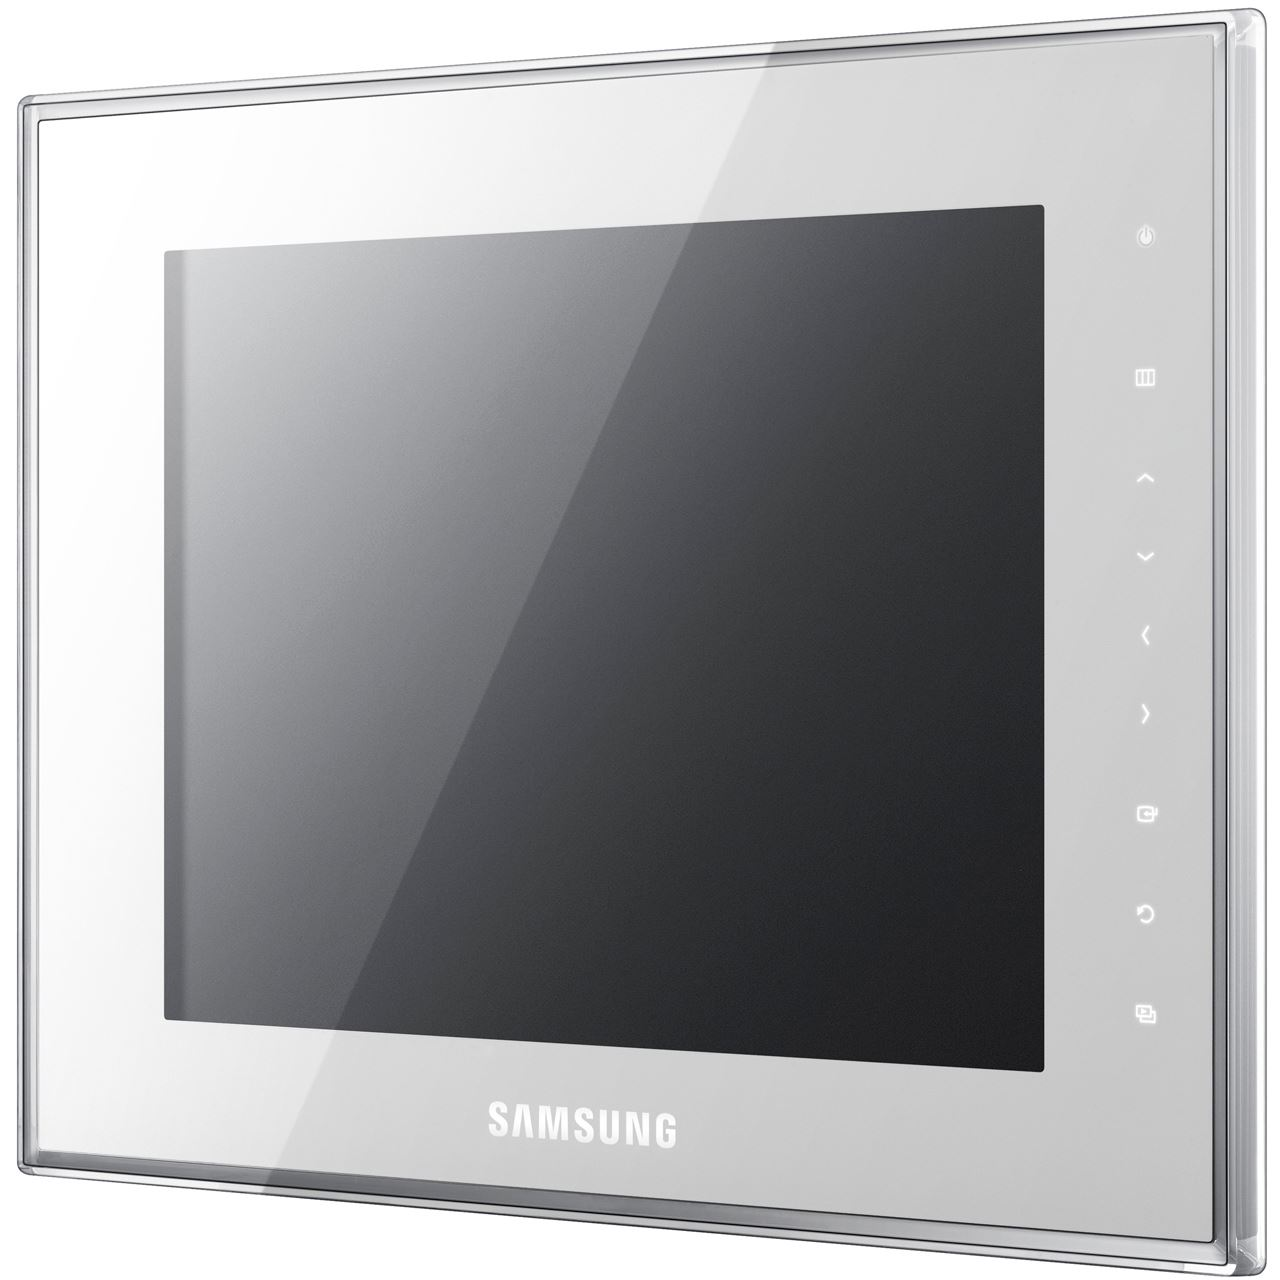 8 0 20 32cm samsung digitaler fotorahmen spf 800w 800x600 1024mb wei. Black Bedroom Furniture Sets. Home Design Ideas